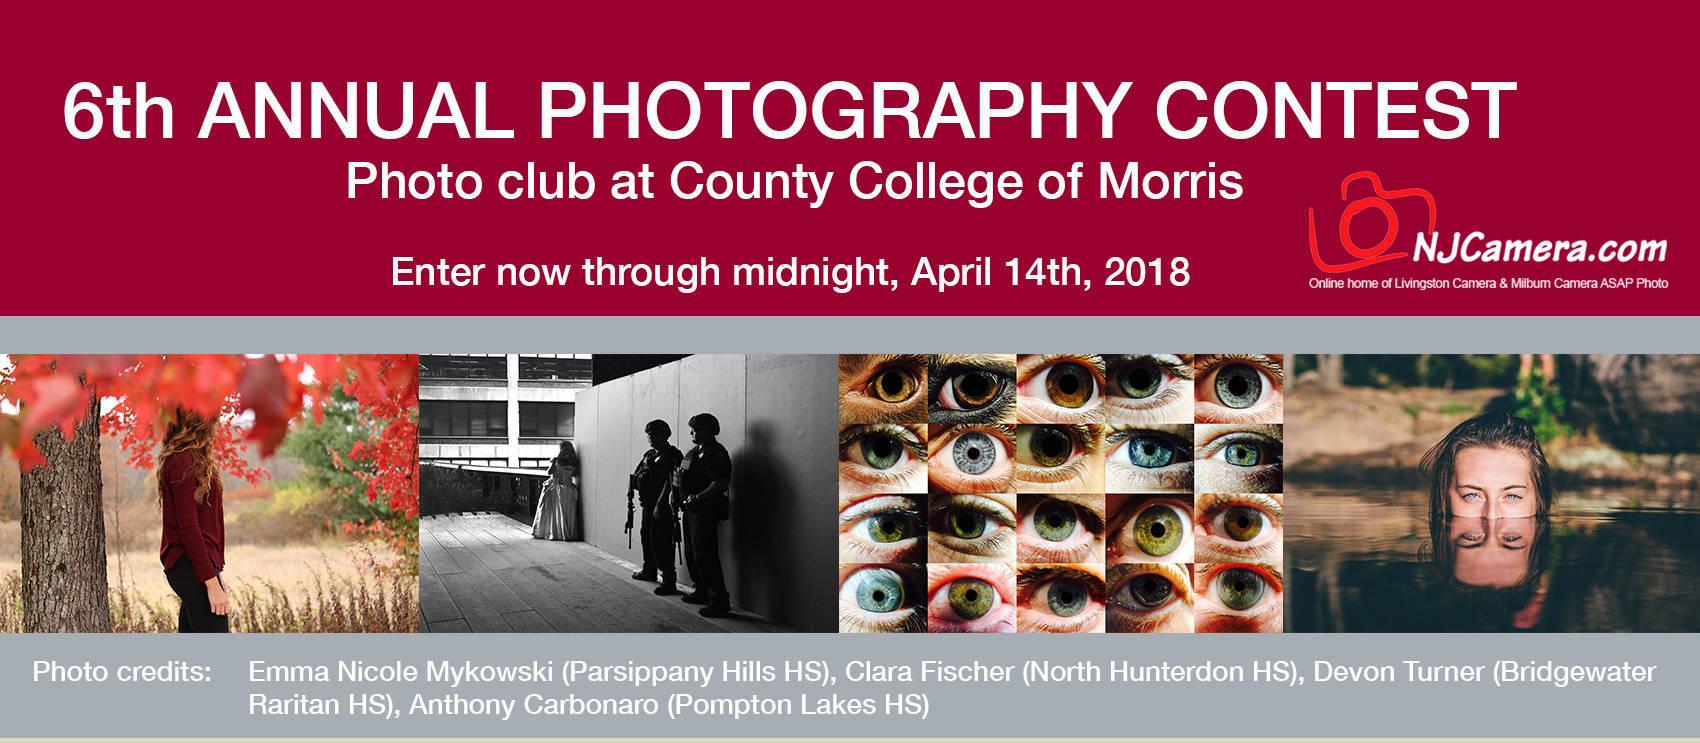 7308b73836a508d02615_Flyer_2018-CCM_Photo_Contest_edited.jpg